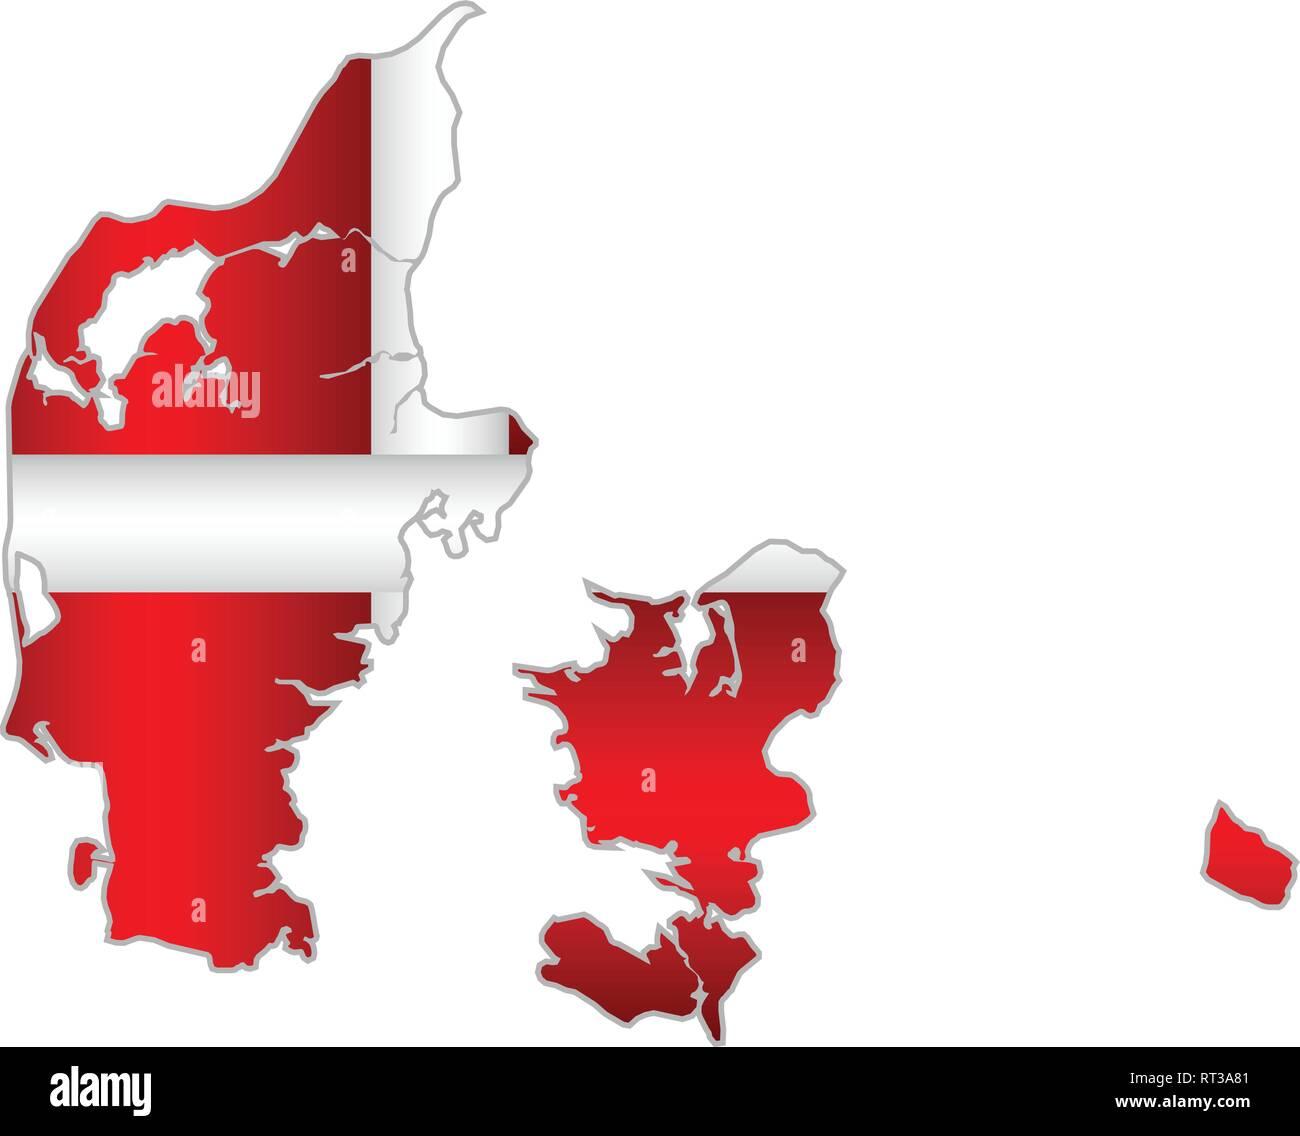 Shiny map of the Denmark - Illustration,  Three Dimensional Map of Denmark - Stock Vector